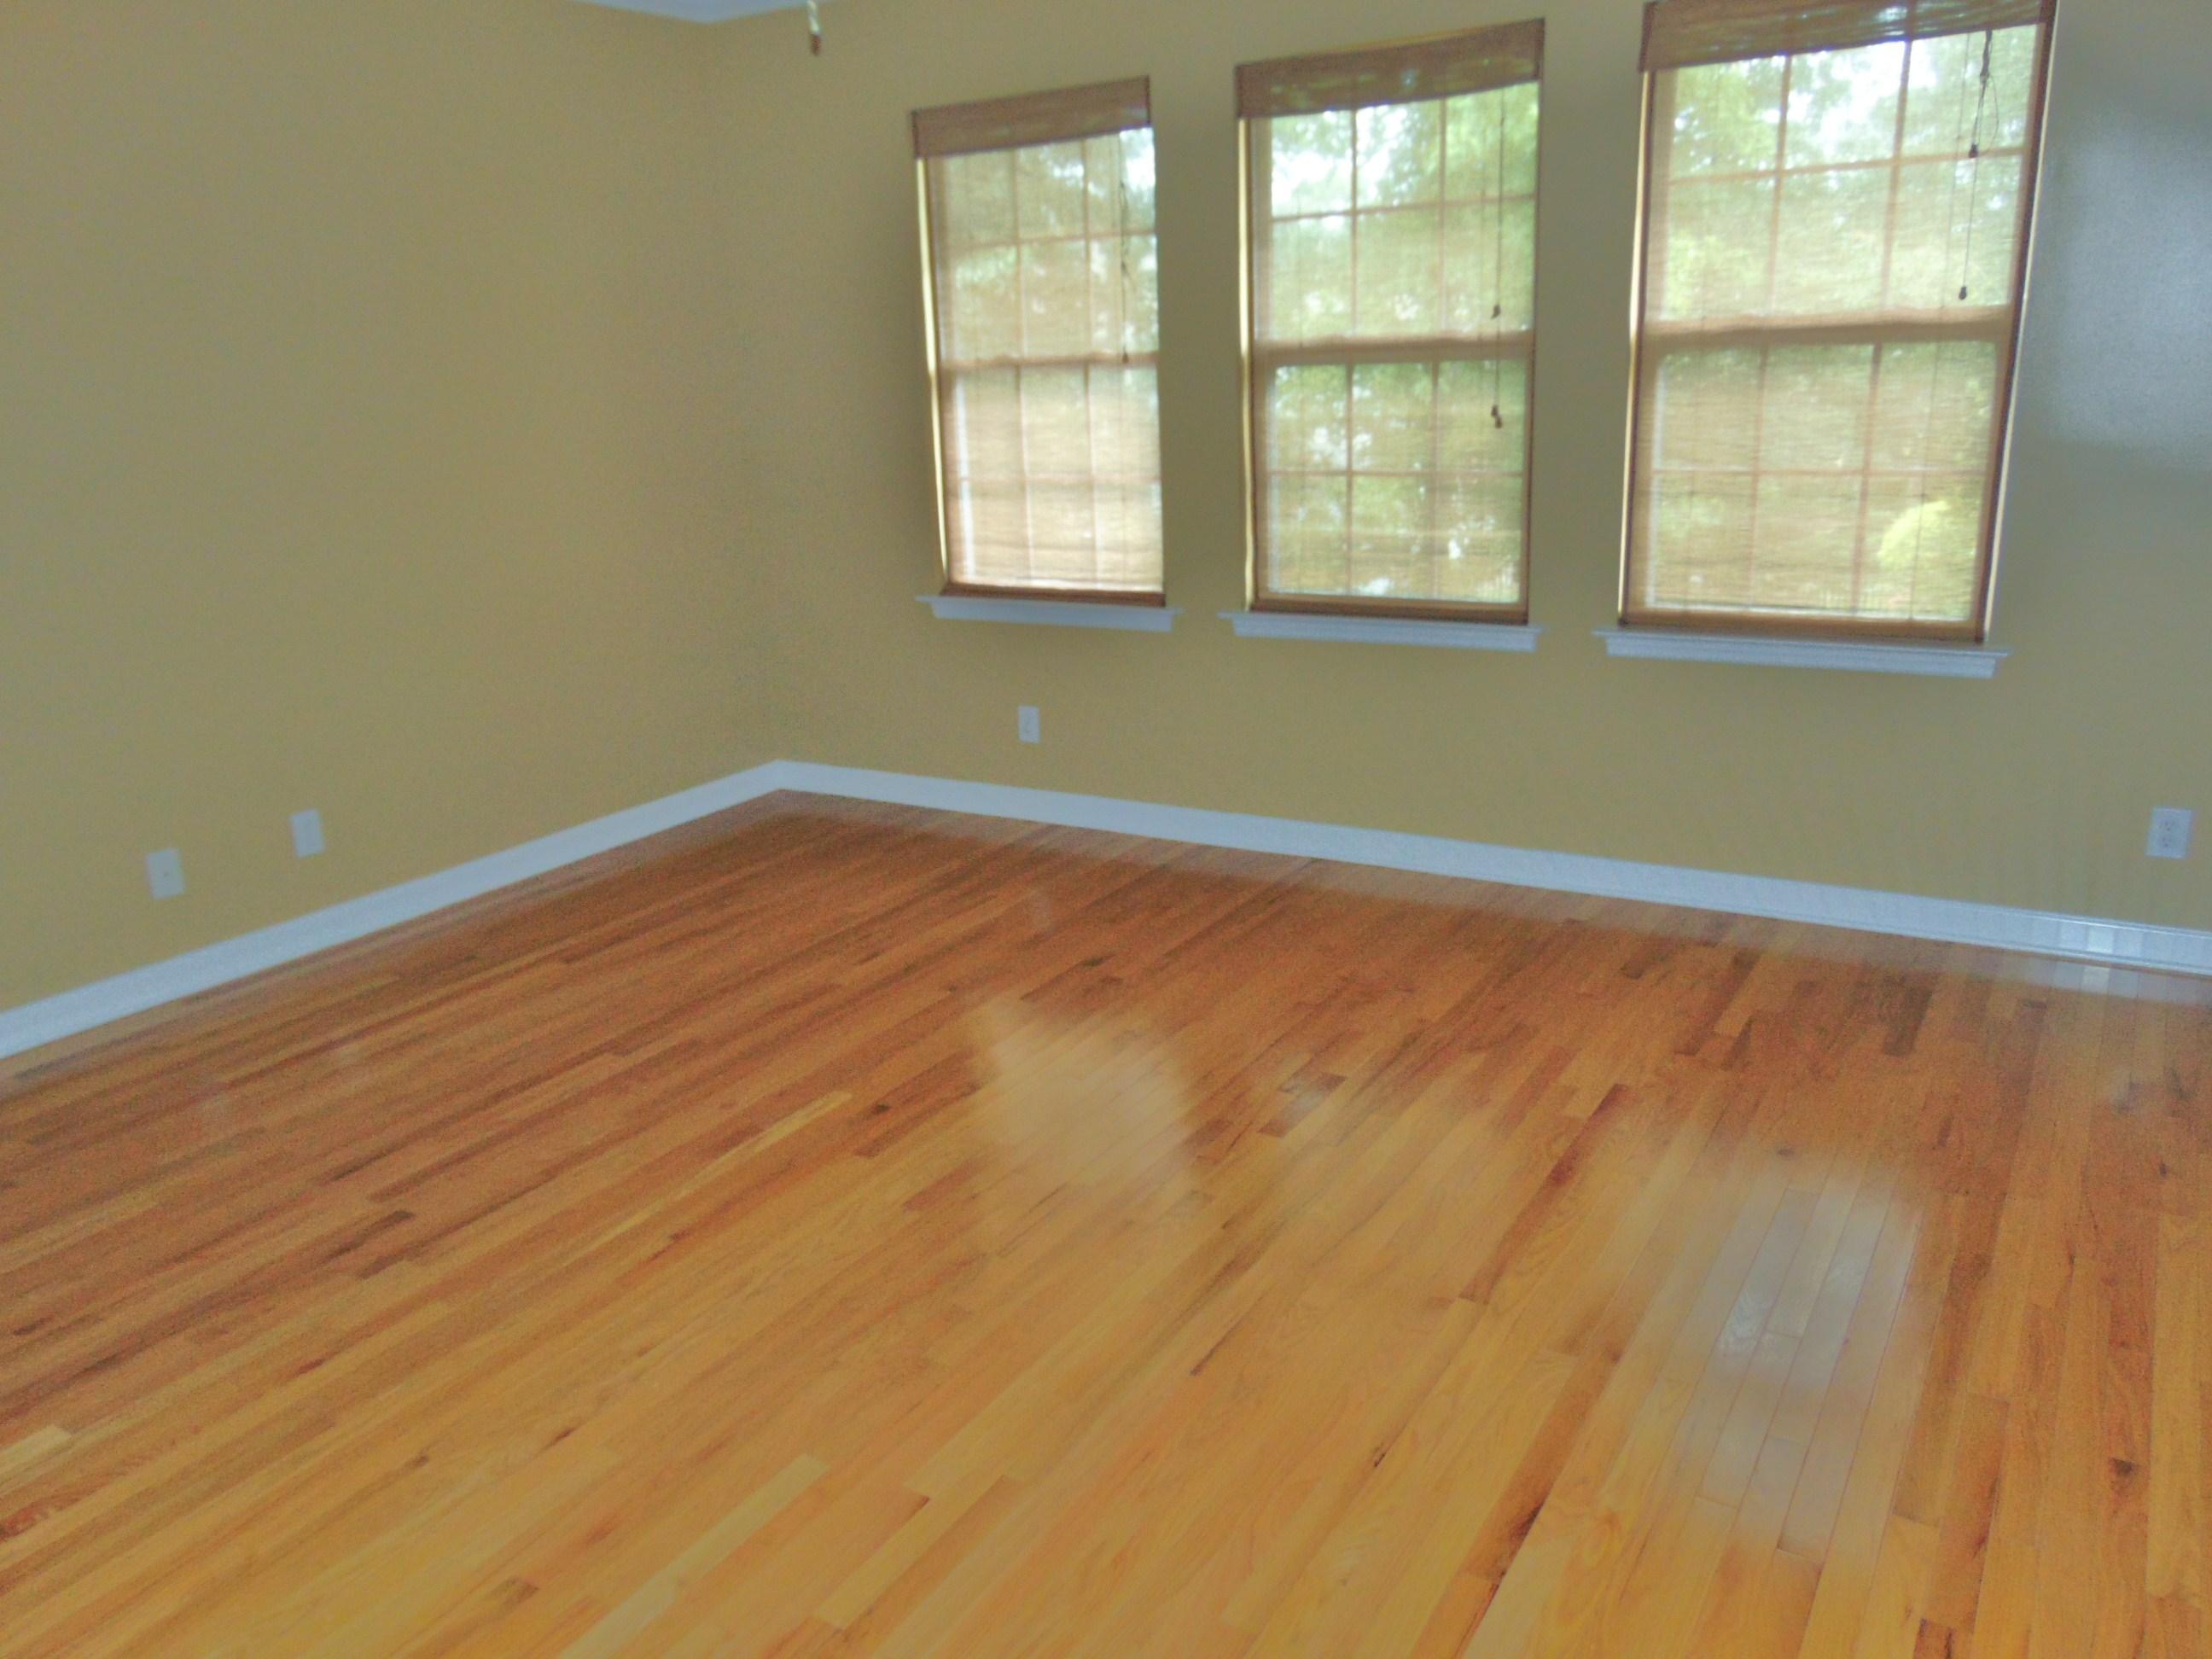 Park West Homes For Sale - 3435 Toomer Kiln, Mount Pleasant, SC - 6